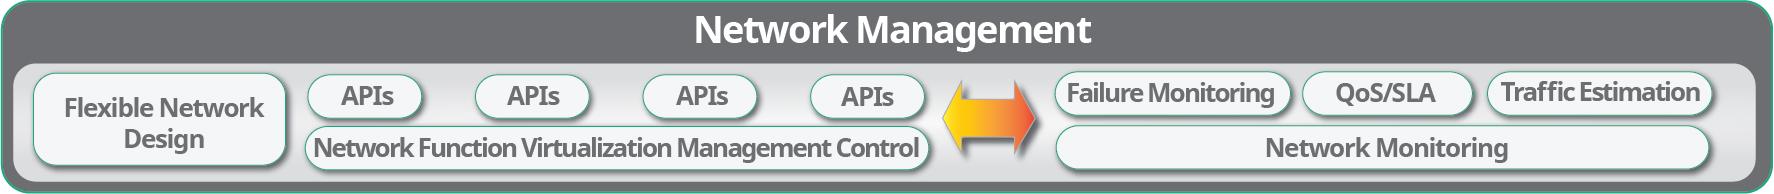 5G Network Monitoring